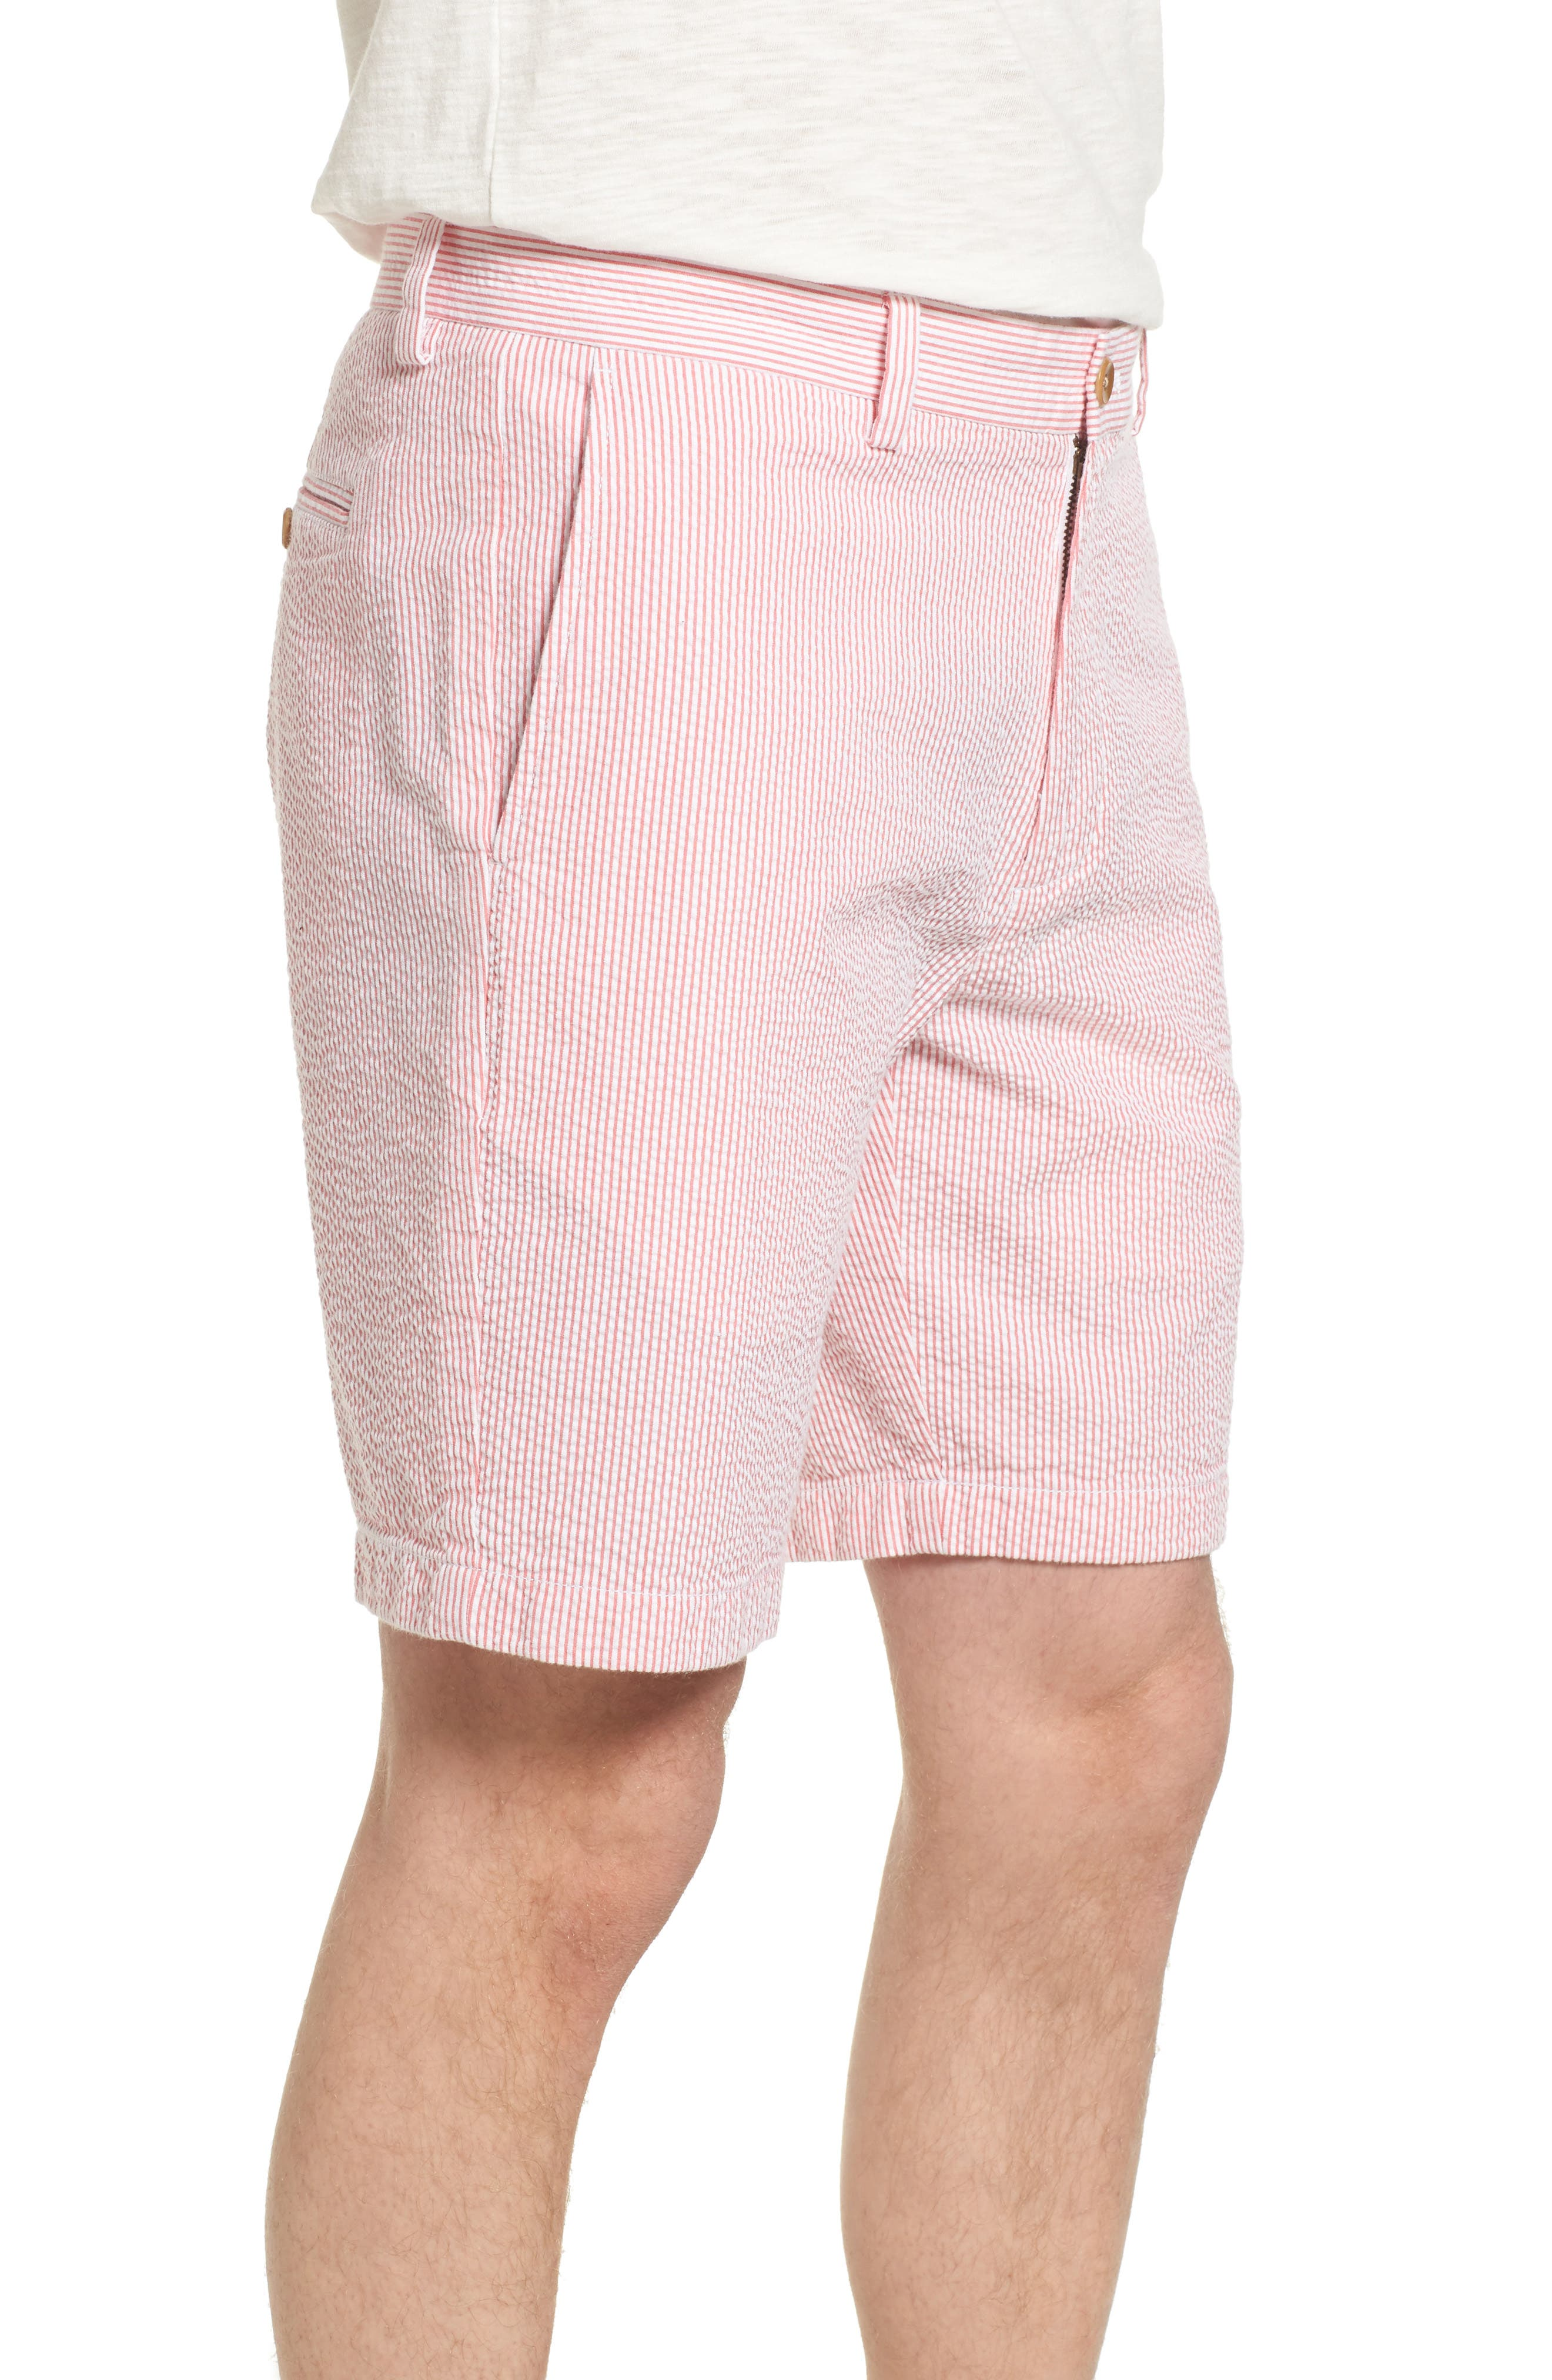 9 Inch Seersucker Shorts,                             Alternate thumbnail 6, color,